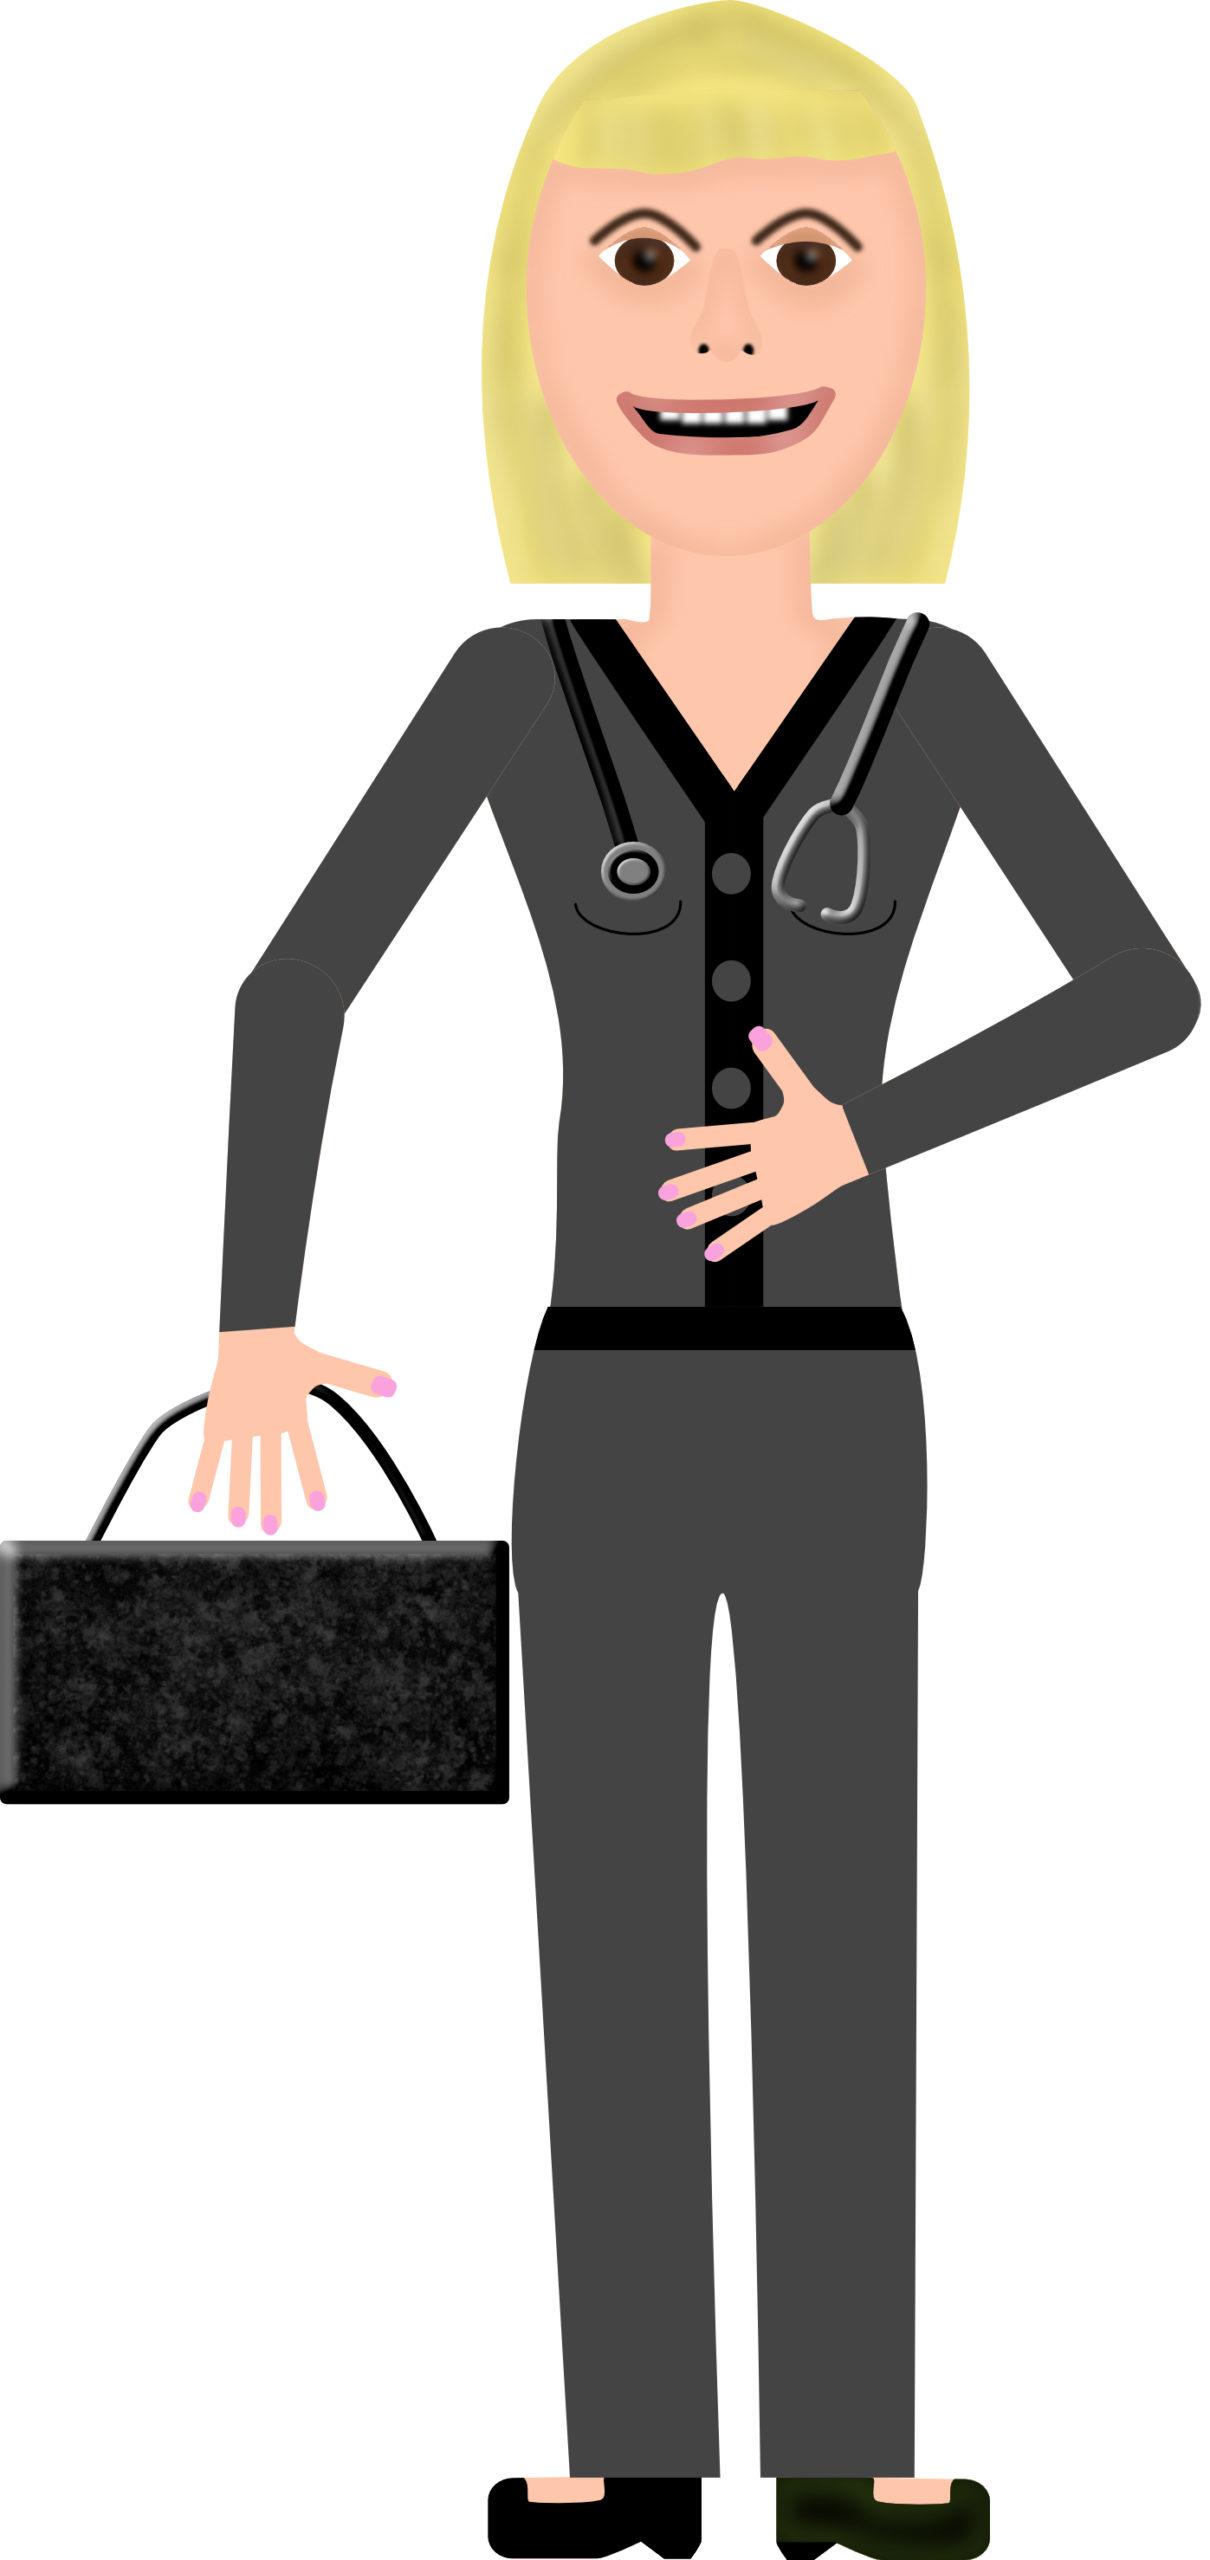 Paula the Paramedic – Character Insight